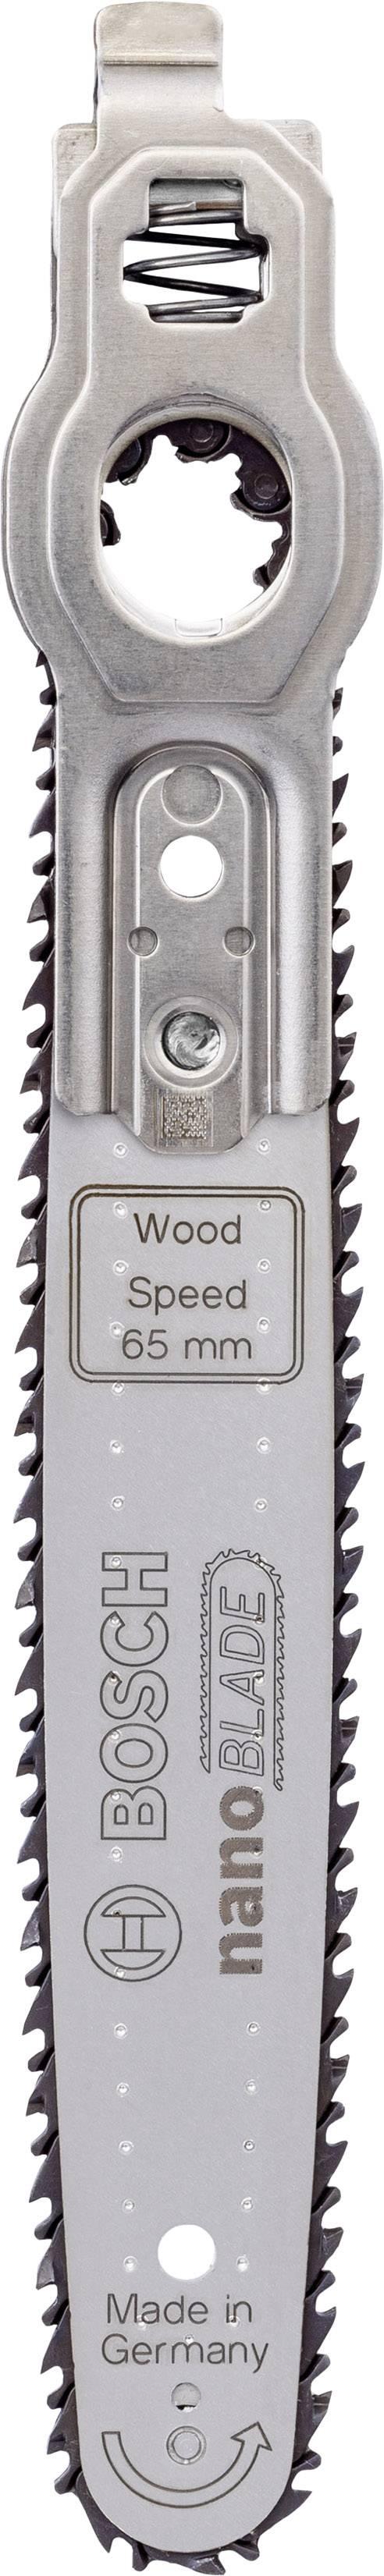 Mikro Kettensägeblatt Bosch Accessories nanoBLADE Wood Speed 65 2609256D86 Passend für EasyCut 50, EasyCut 12, AdvancedC